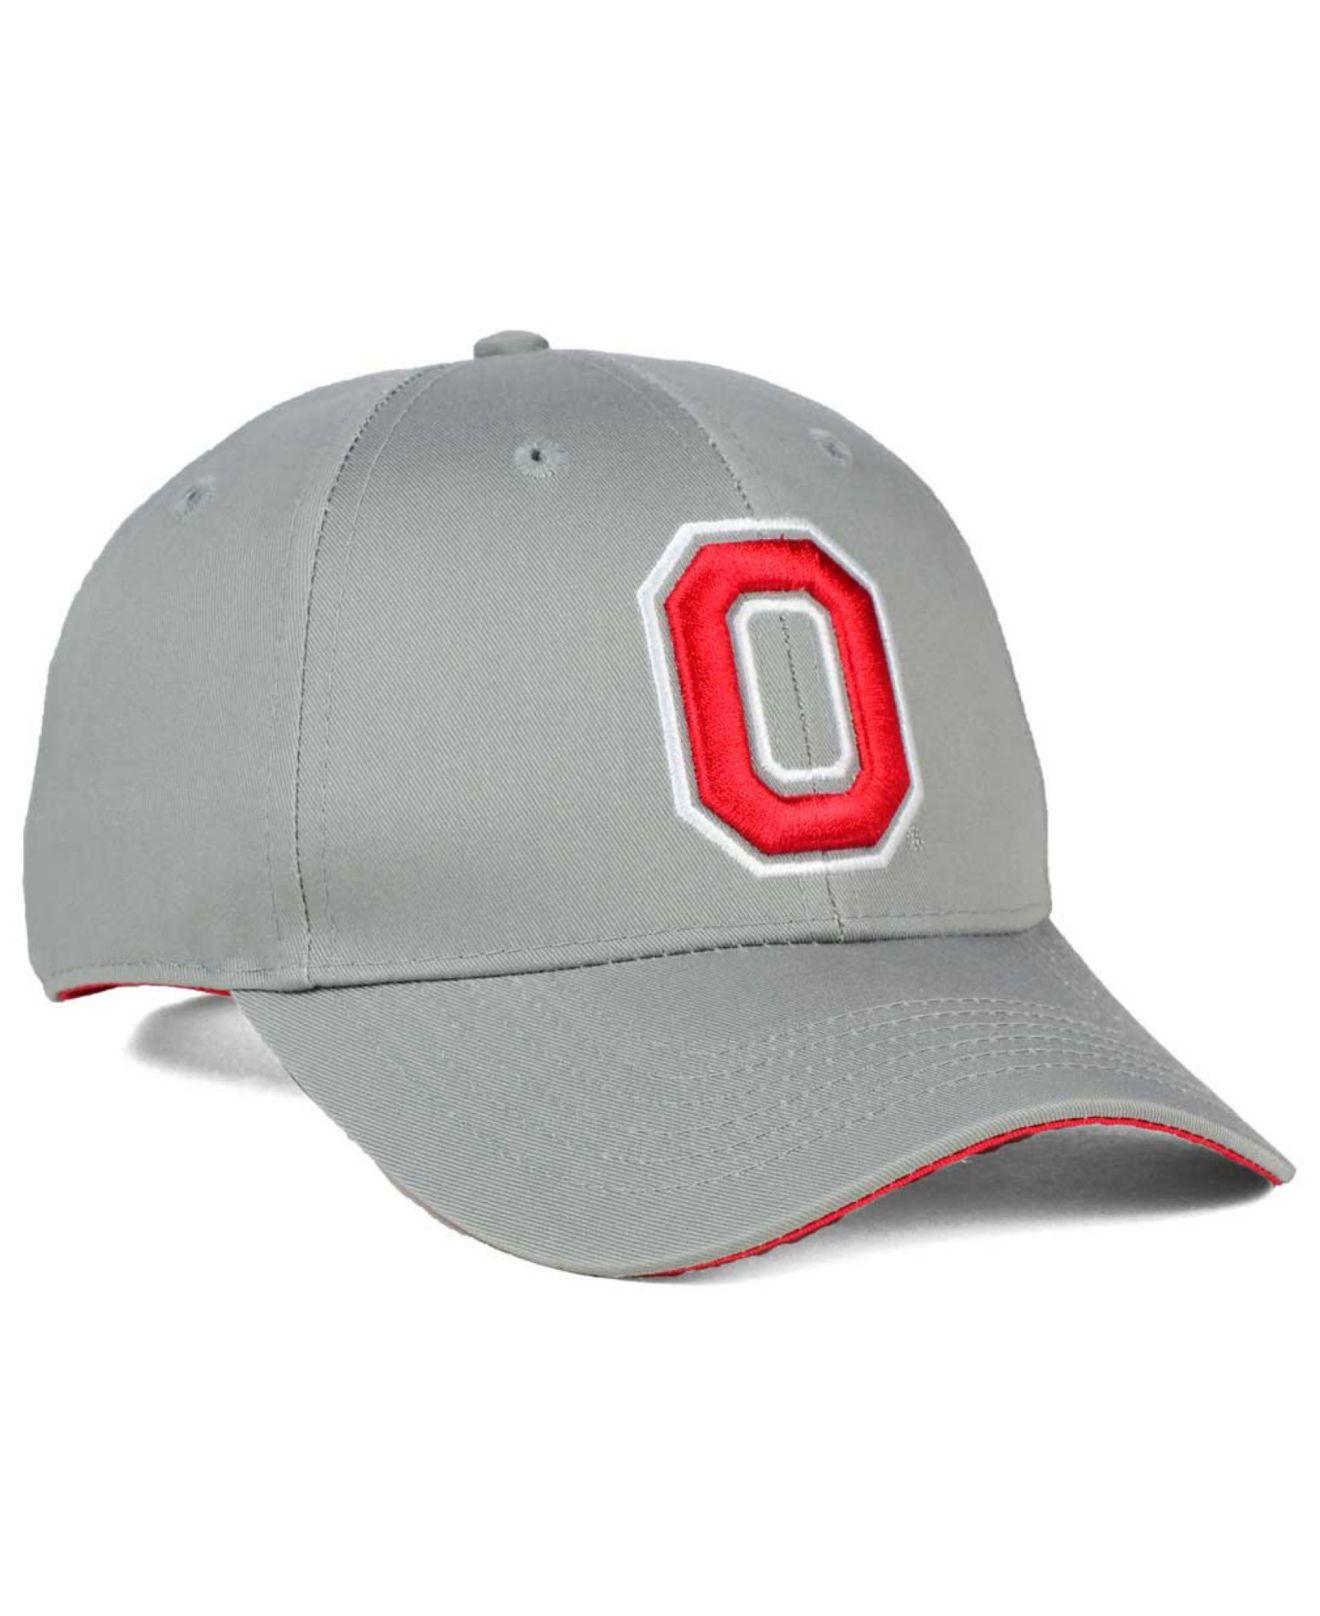 Lyst - J America Ohio State Buckeyes Osu Snapback Cap in Gray e3077649c537